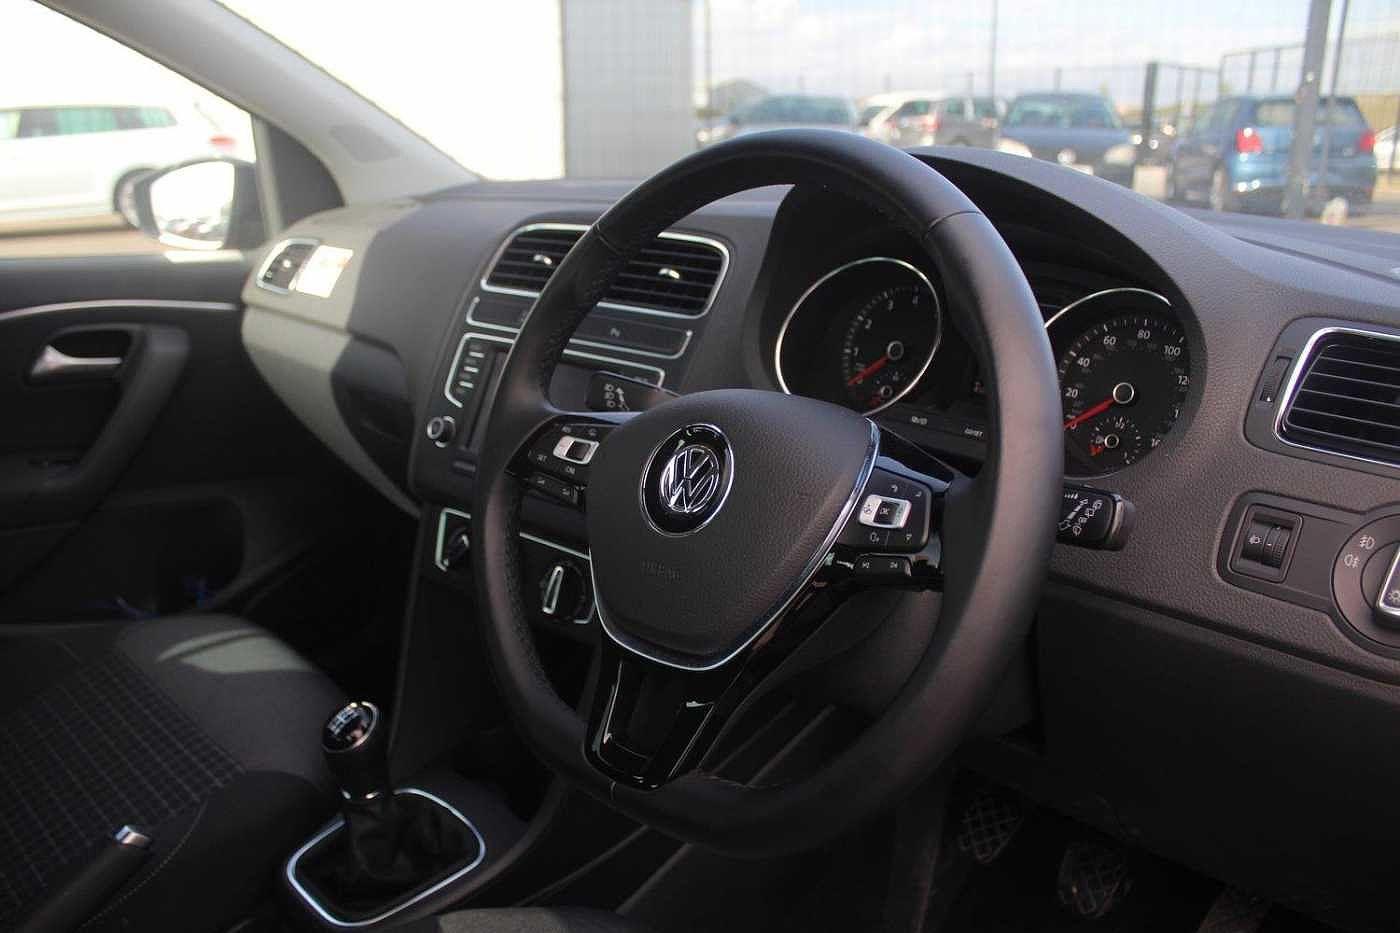 Volkswagen Polo Mark 5 1.0 (60 PS) New Match BMT 5dr Hatchback